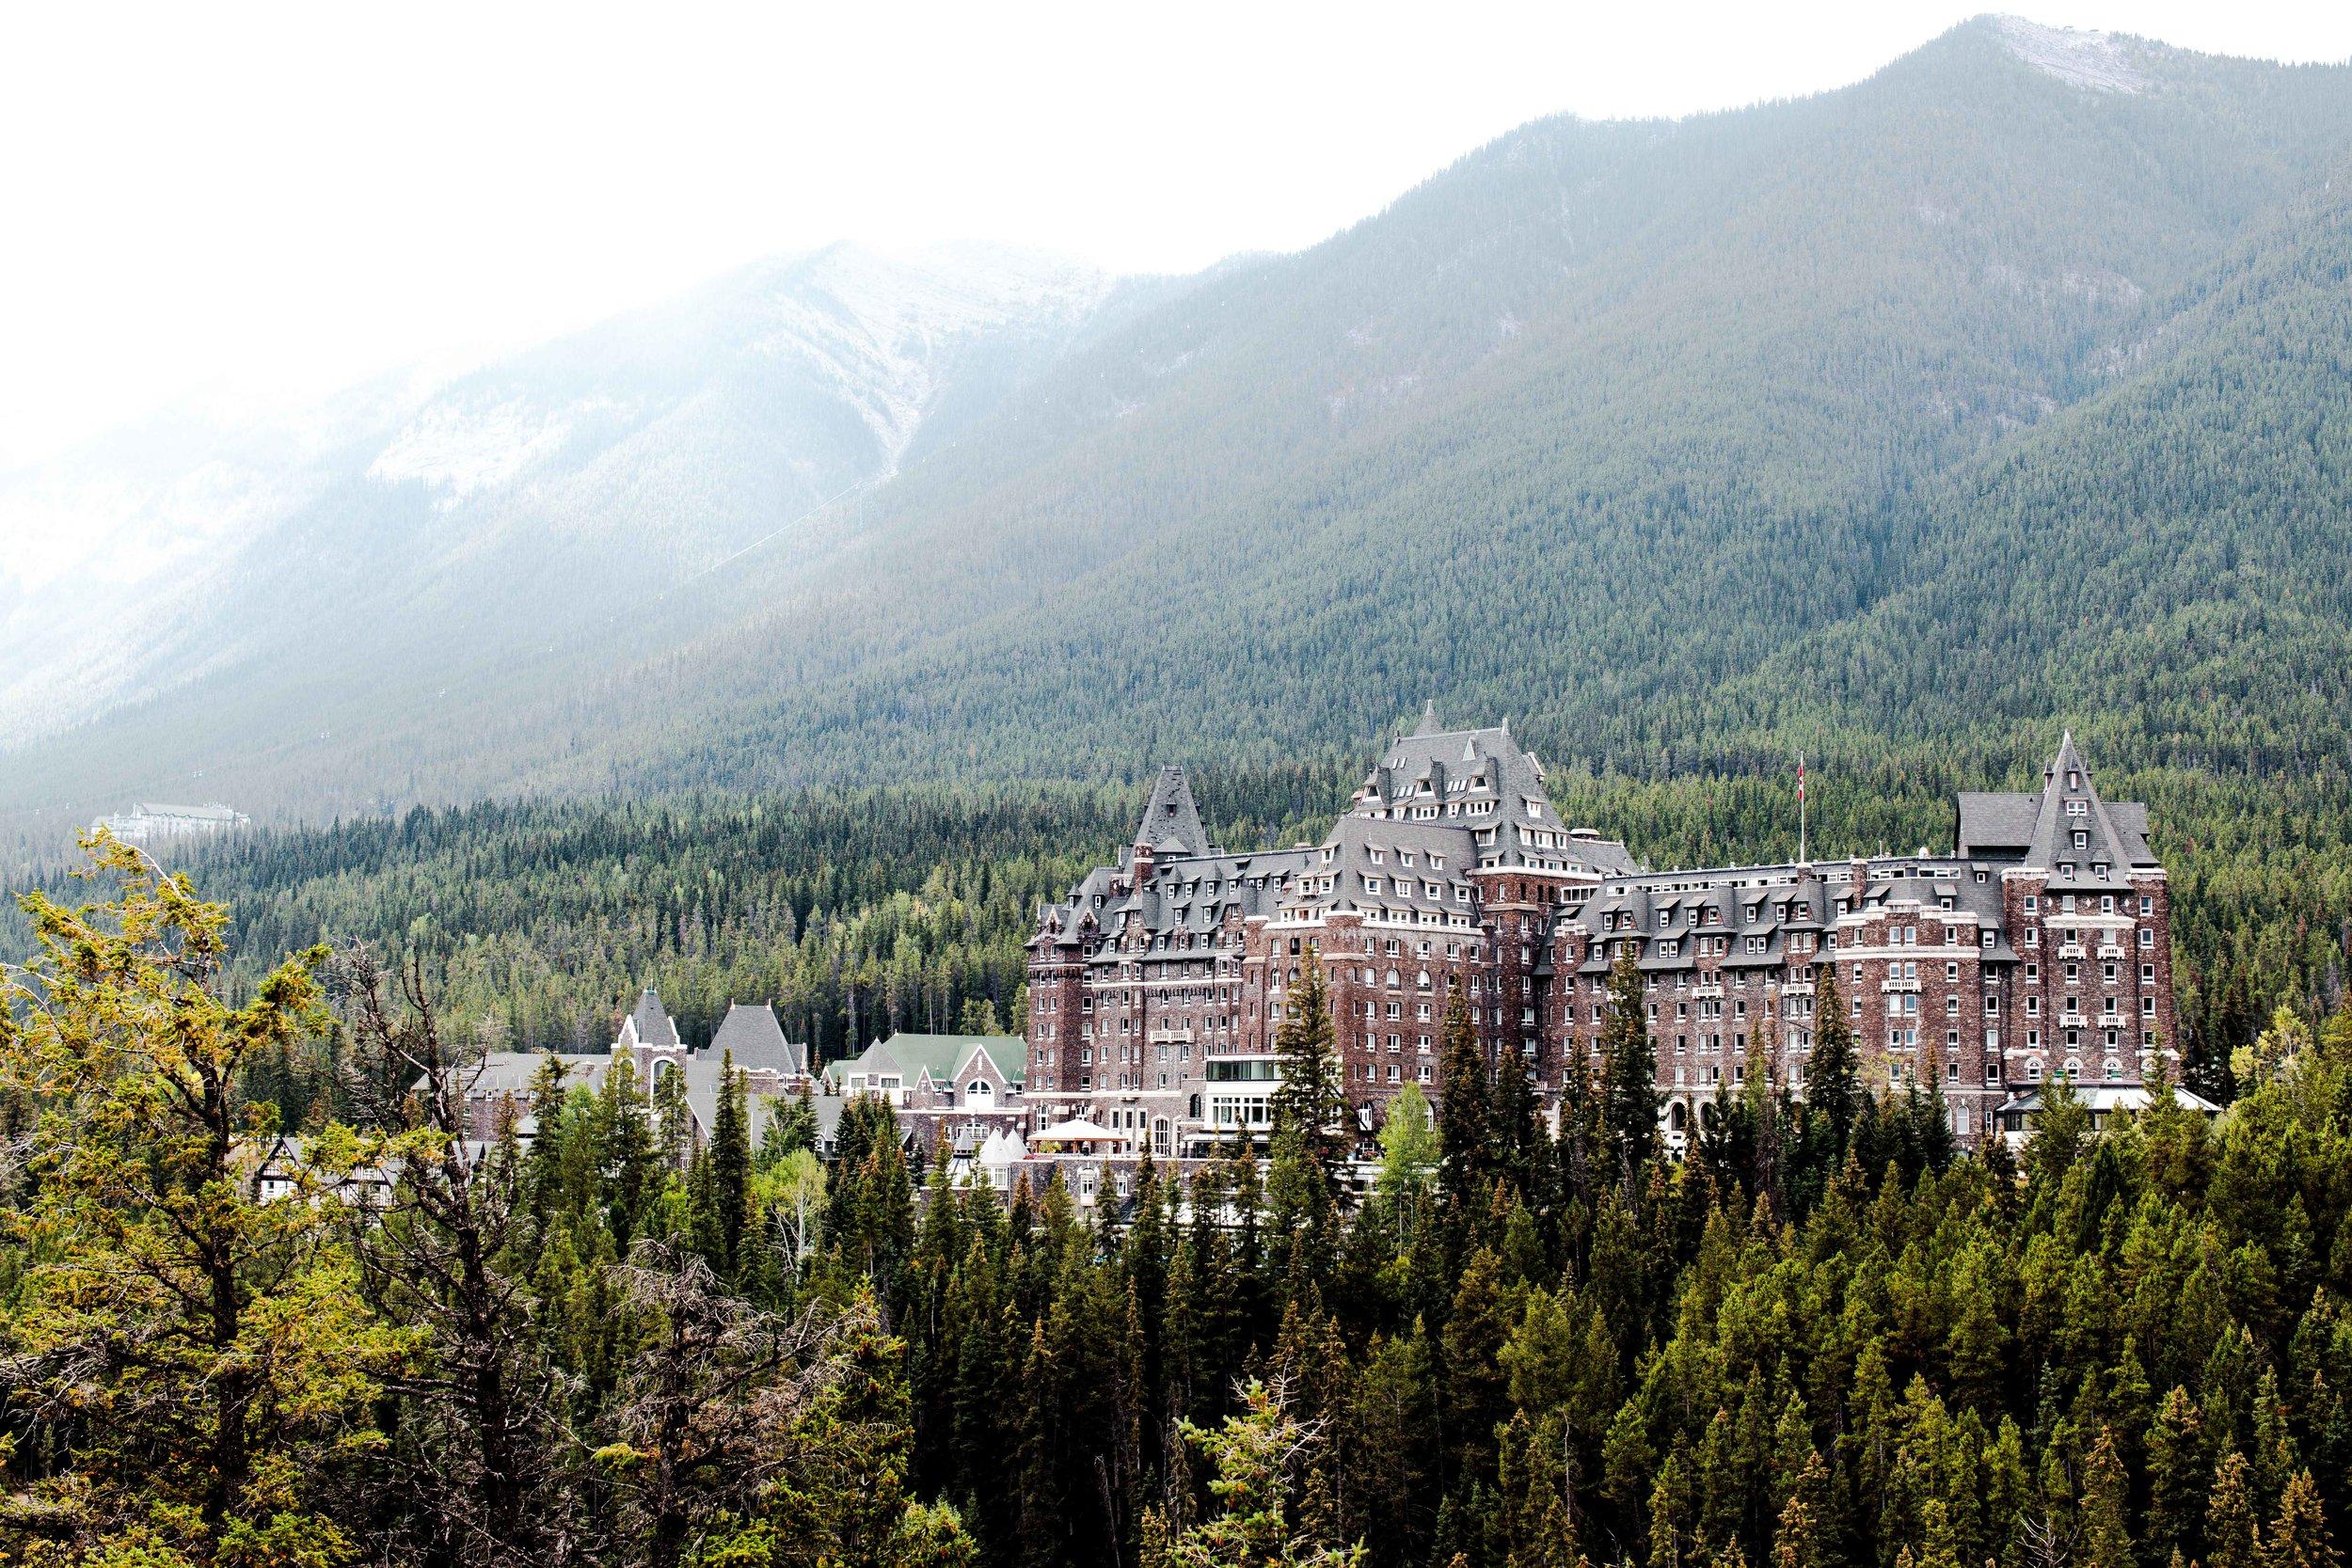 Banff-2018-Day-2-1.jpg